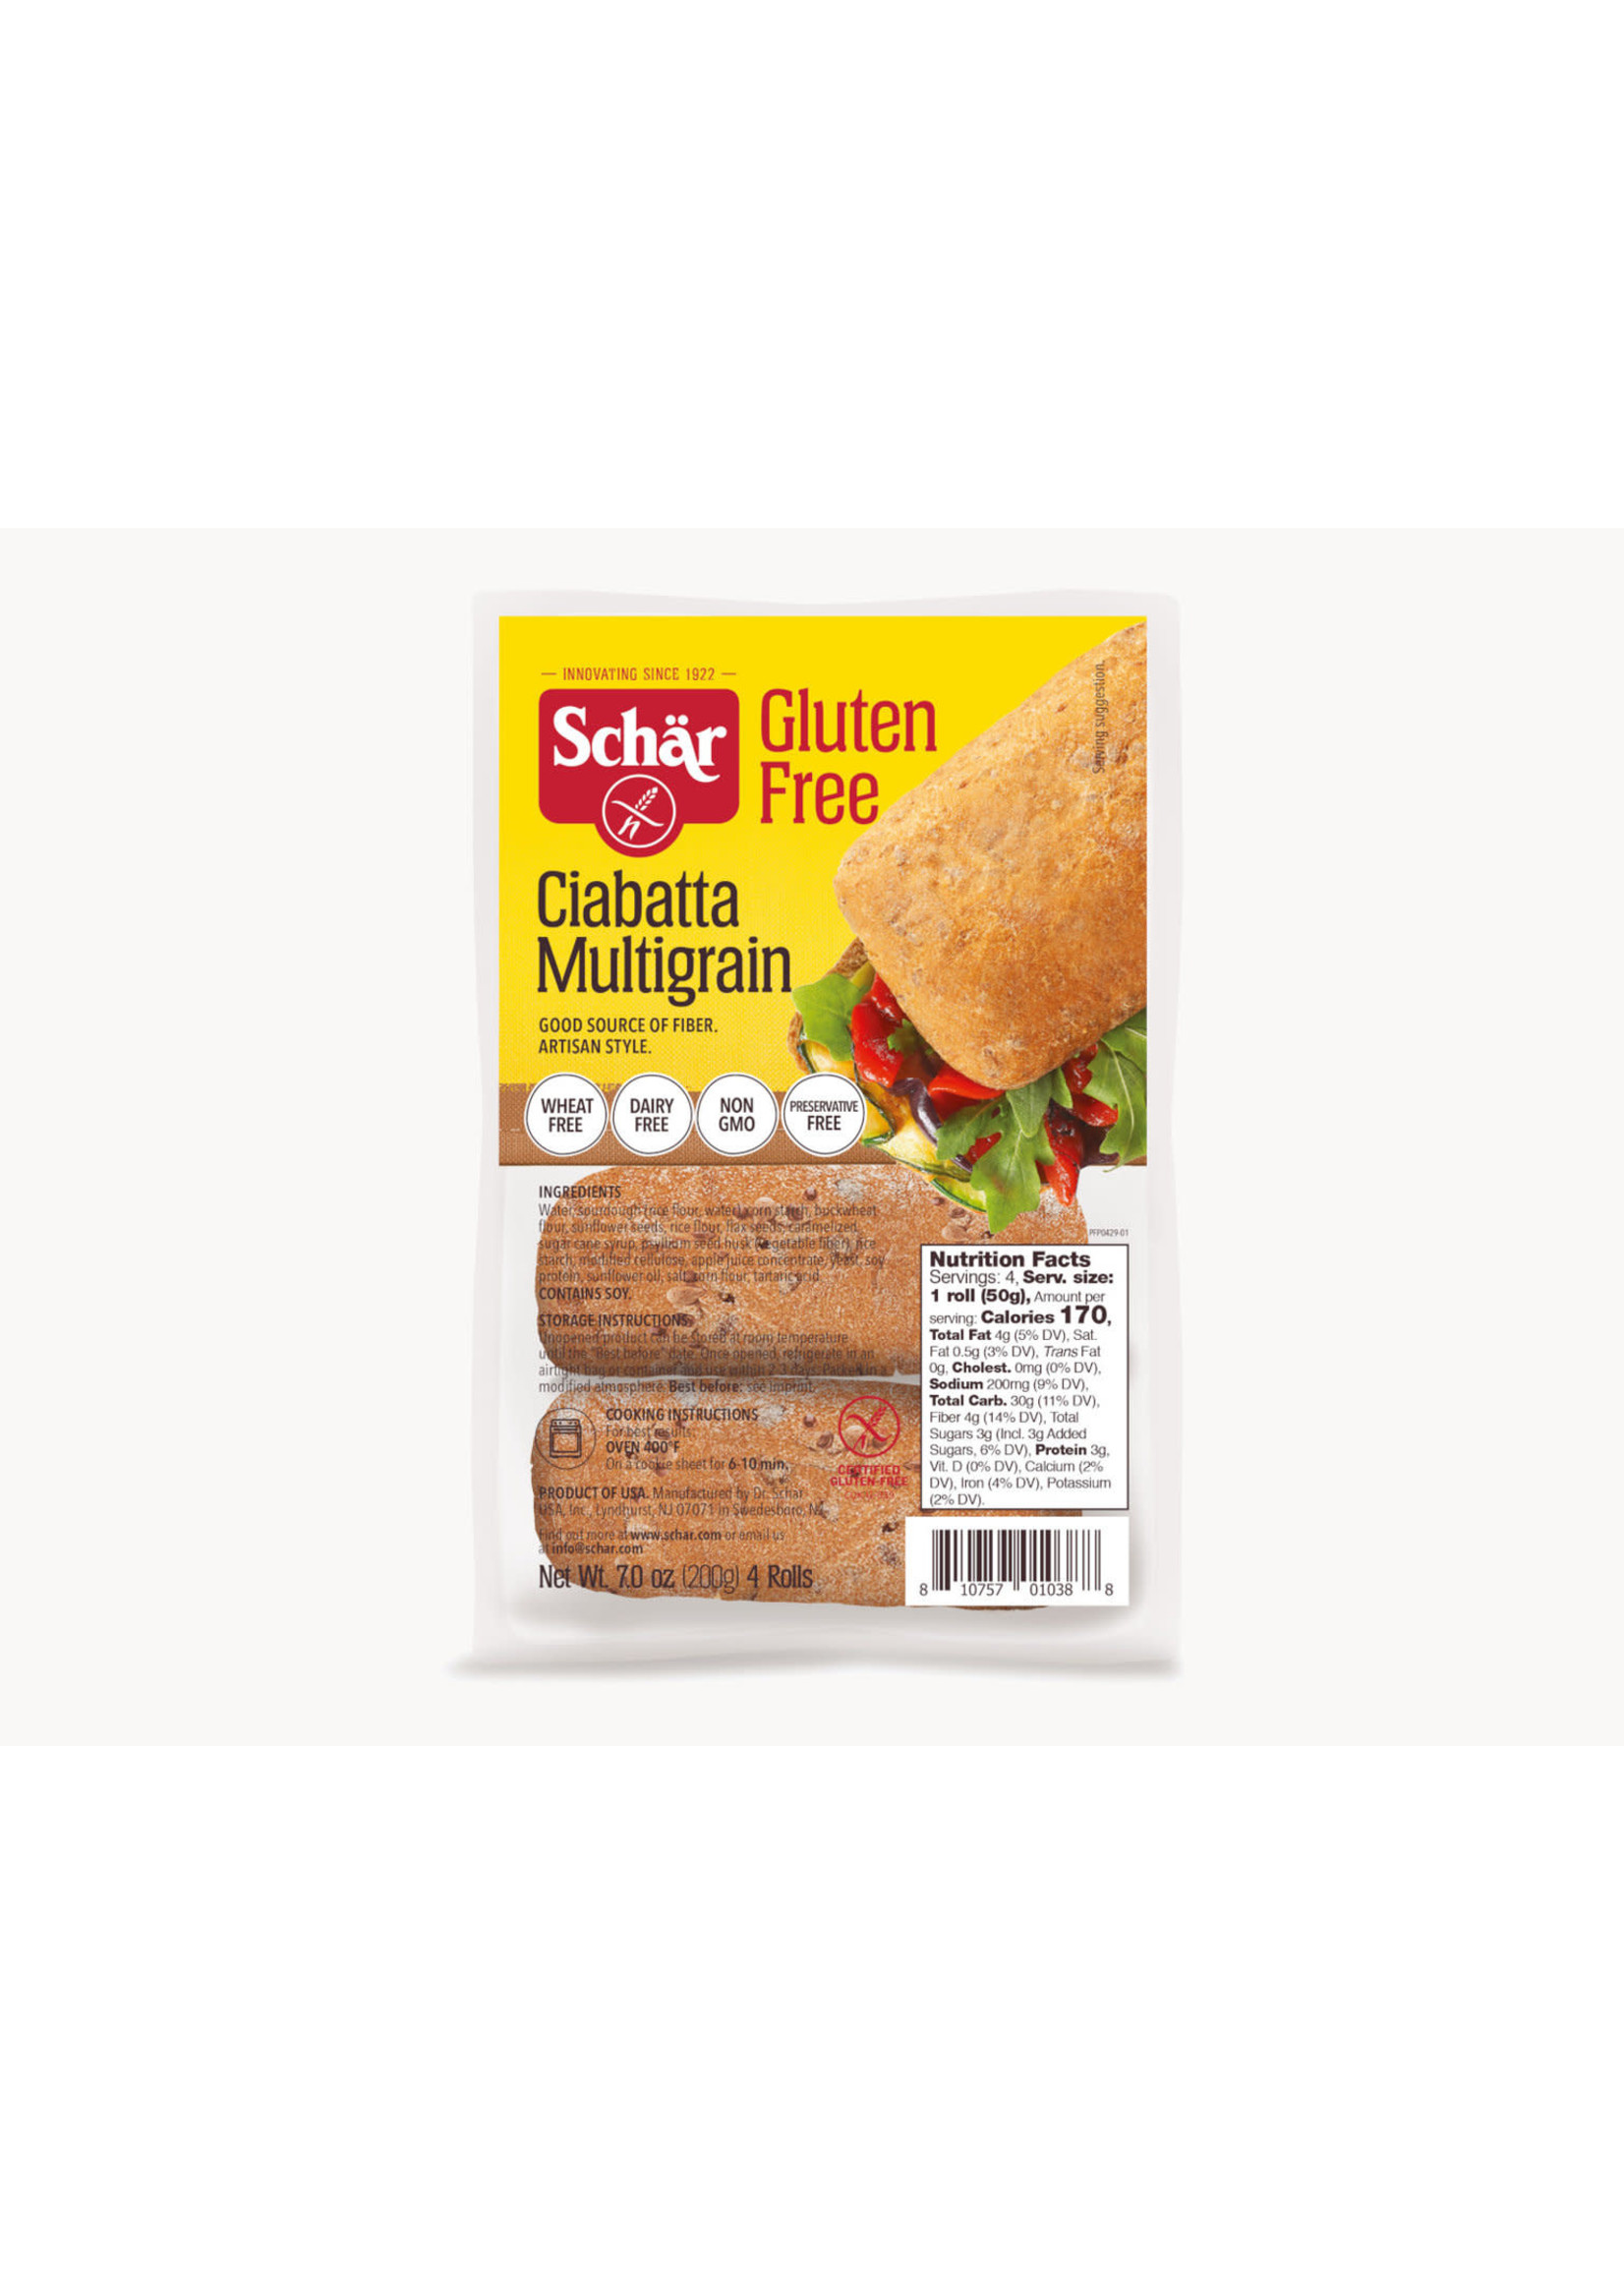 Schar Gluten Free Multigrain Ciabatta Buns Schar